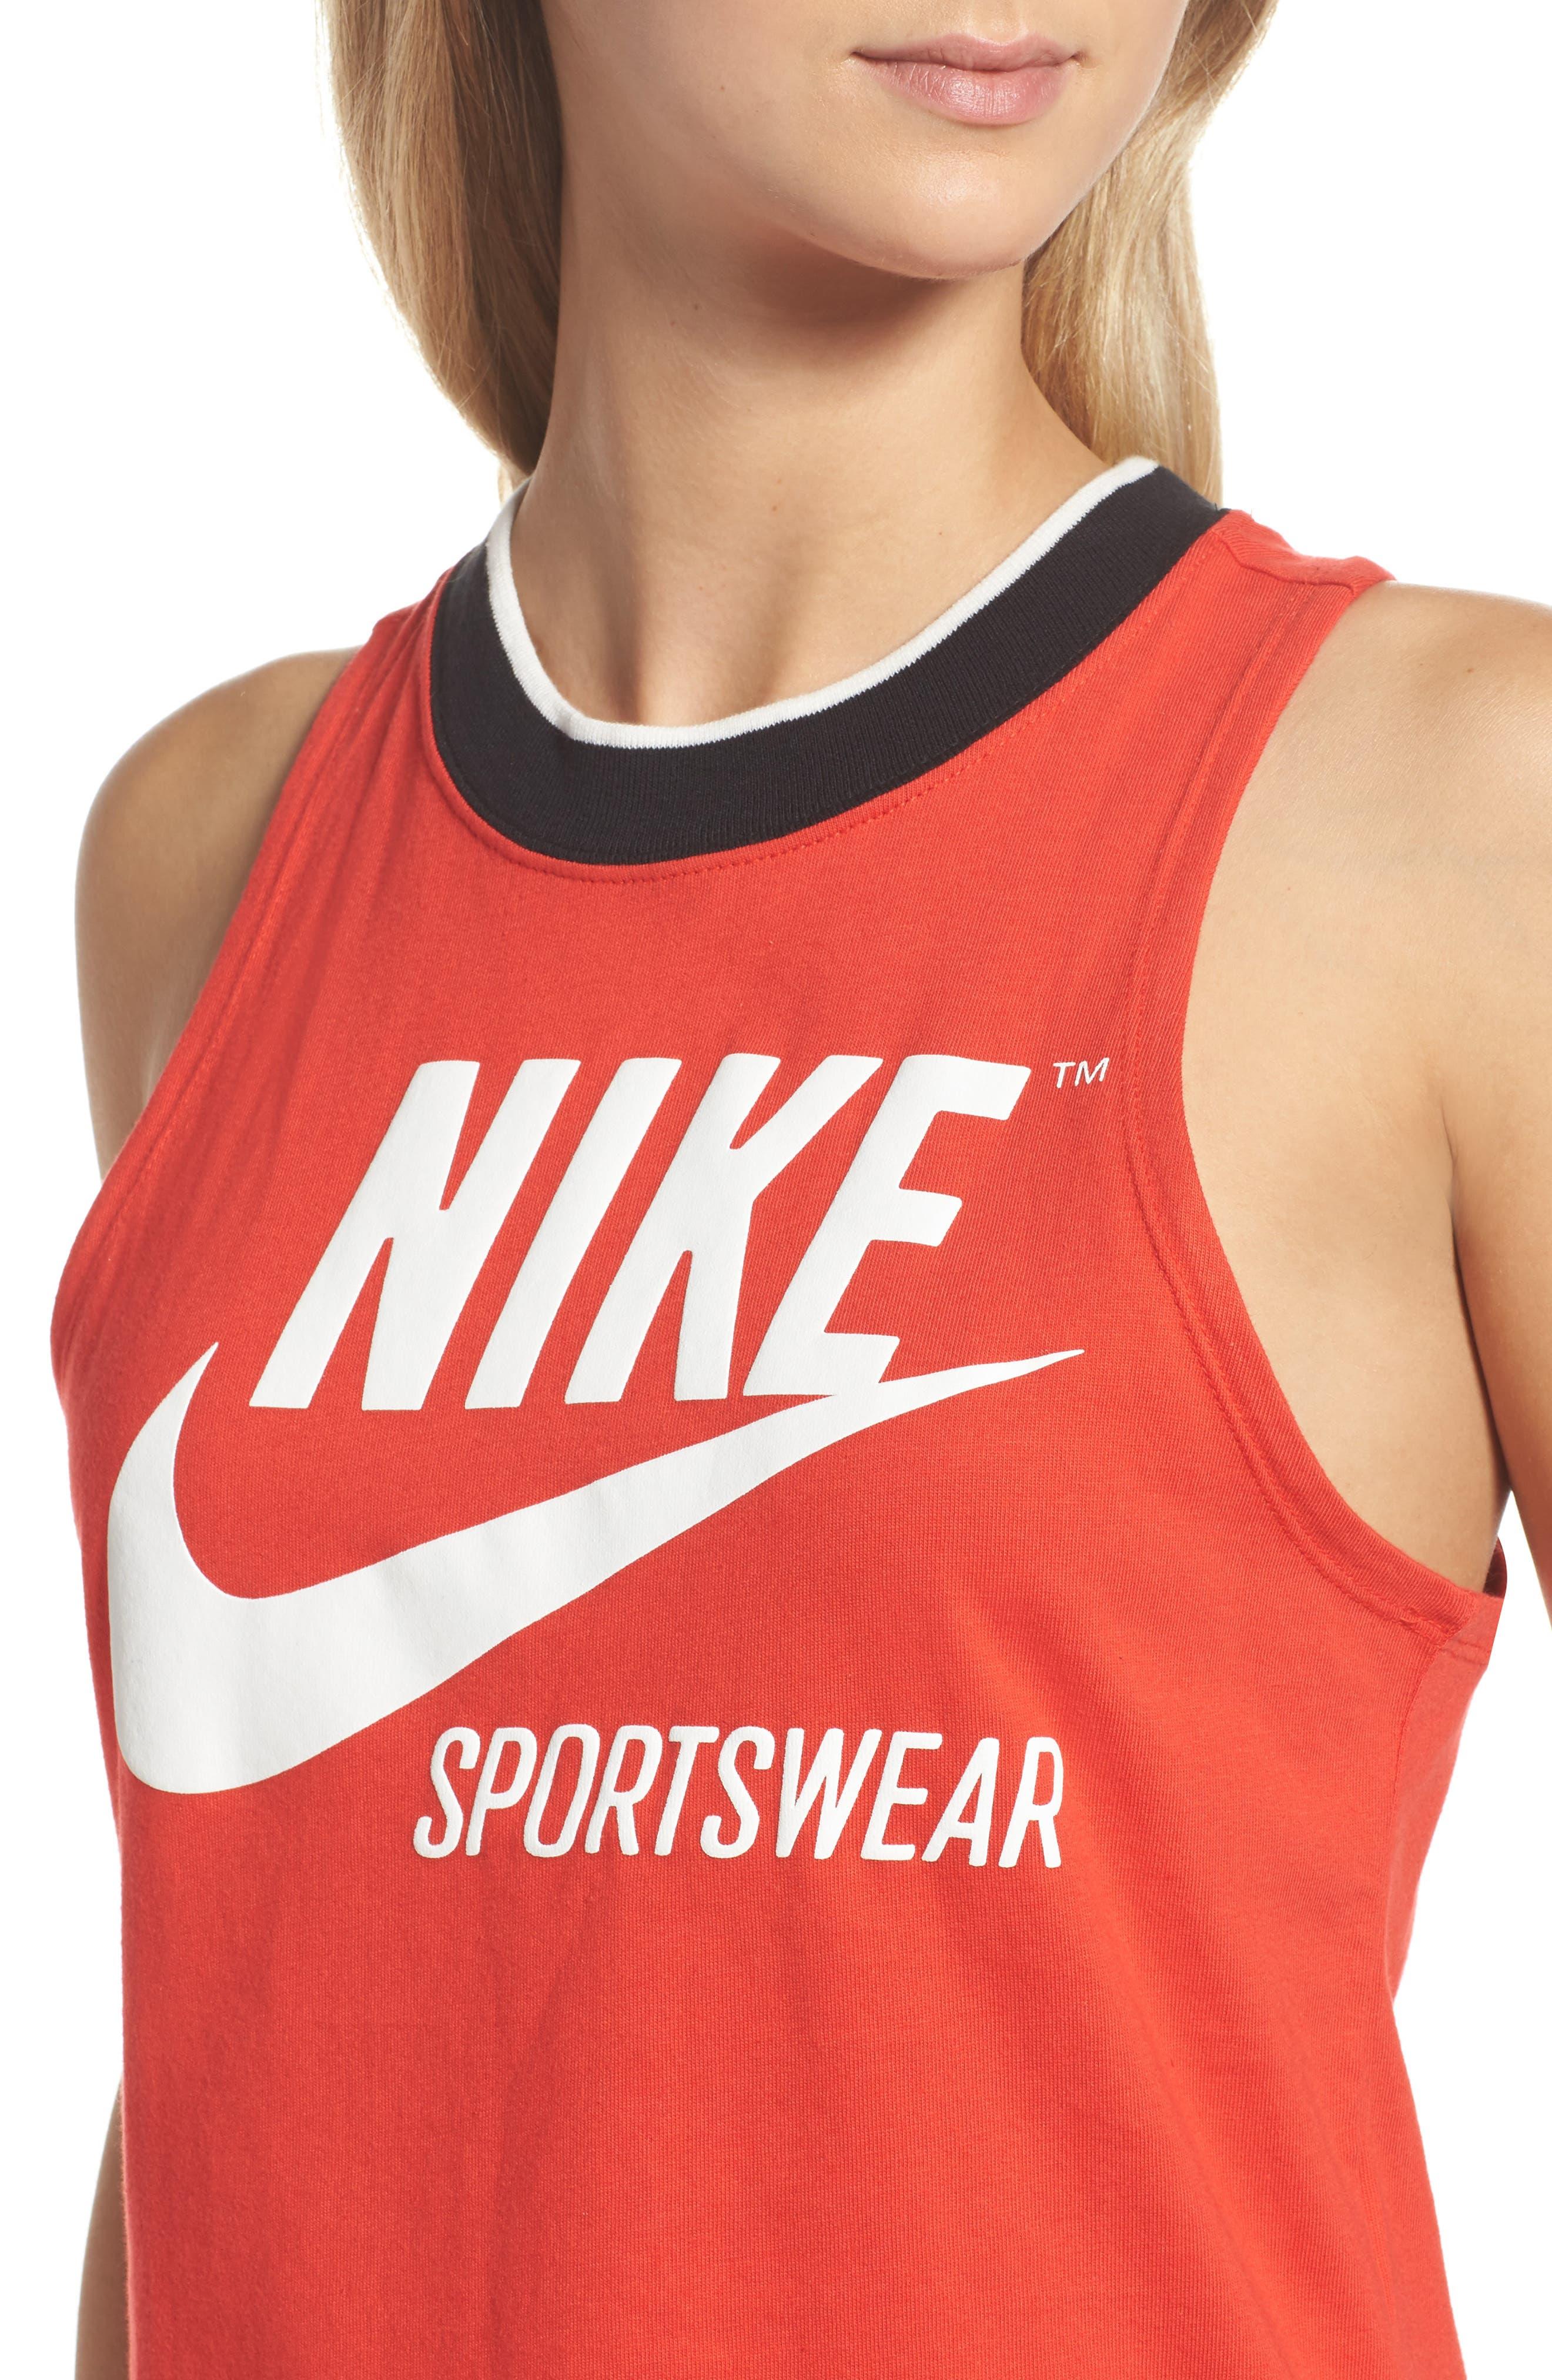 Sportswear Archive Crop Tank,                             Alternate thumbnail 4, color,                             600